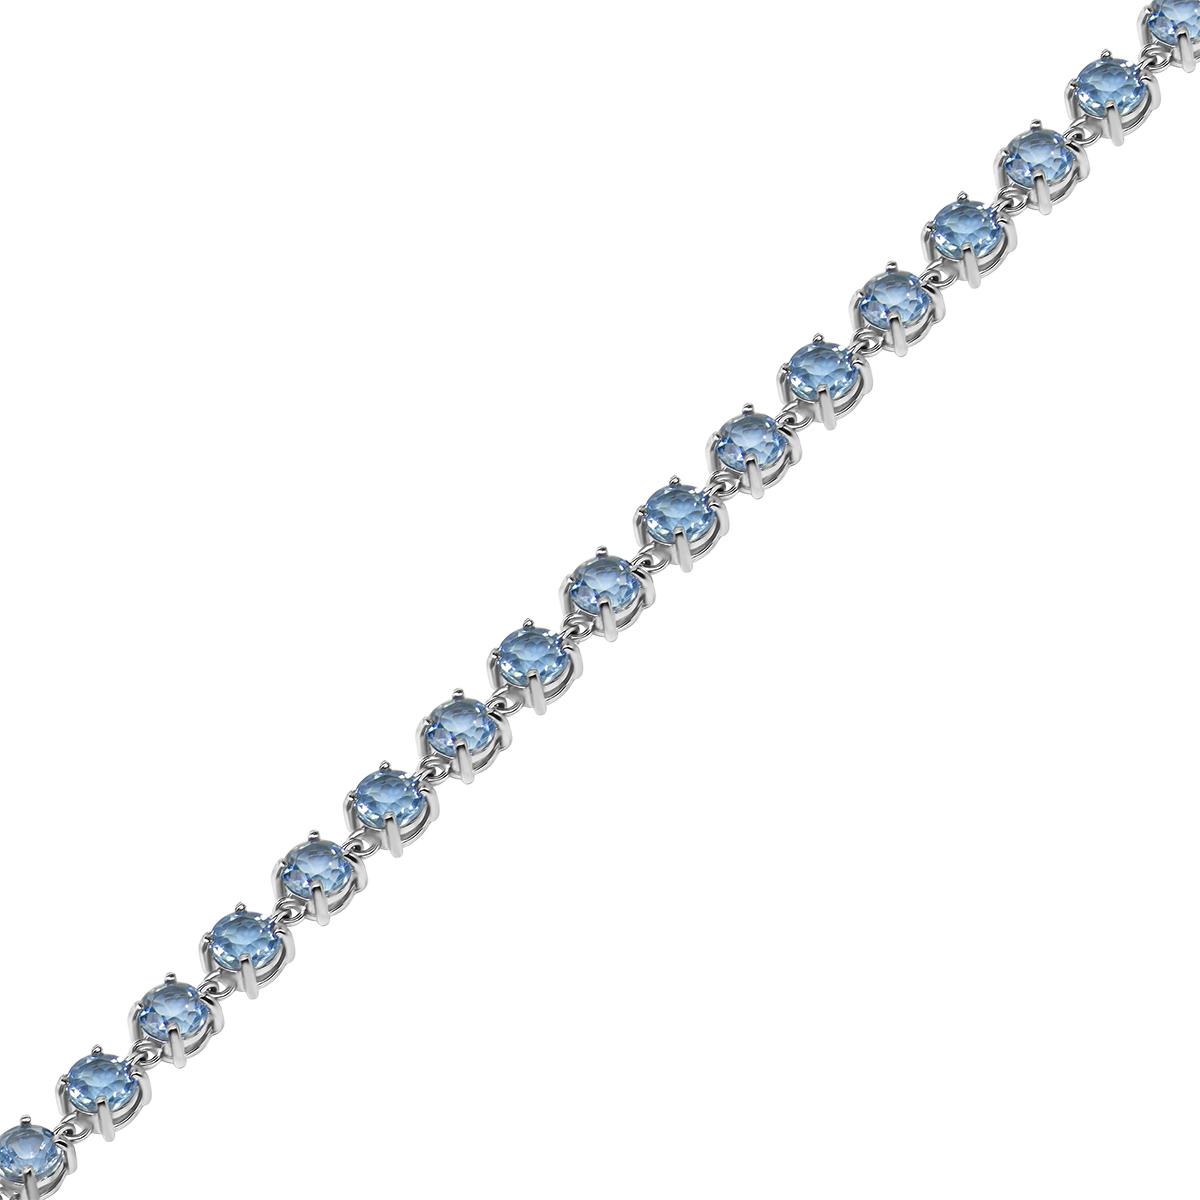 Браслет женский Balex Jewellery 7405937842 из серебра, топаз, р. 21